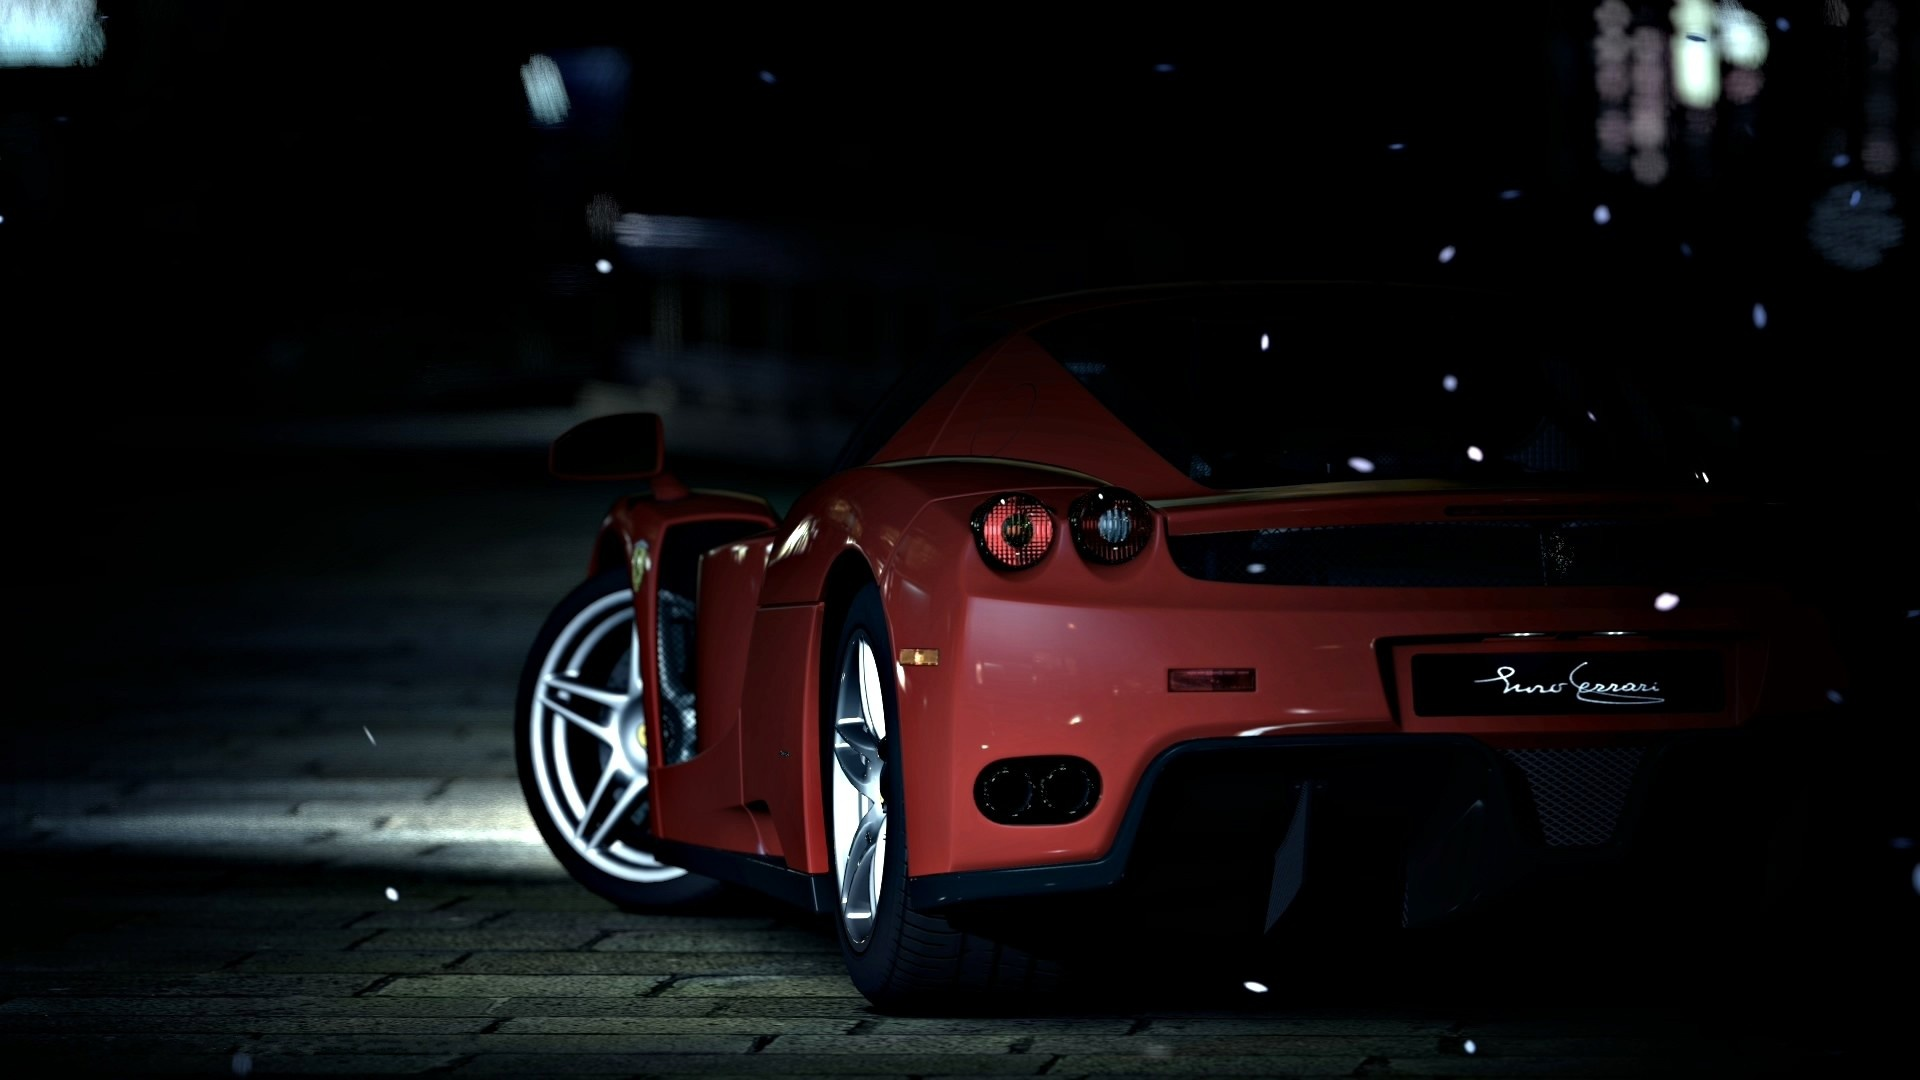 Ferrari Hd Wallpaper